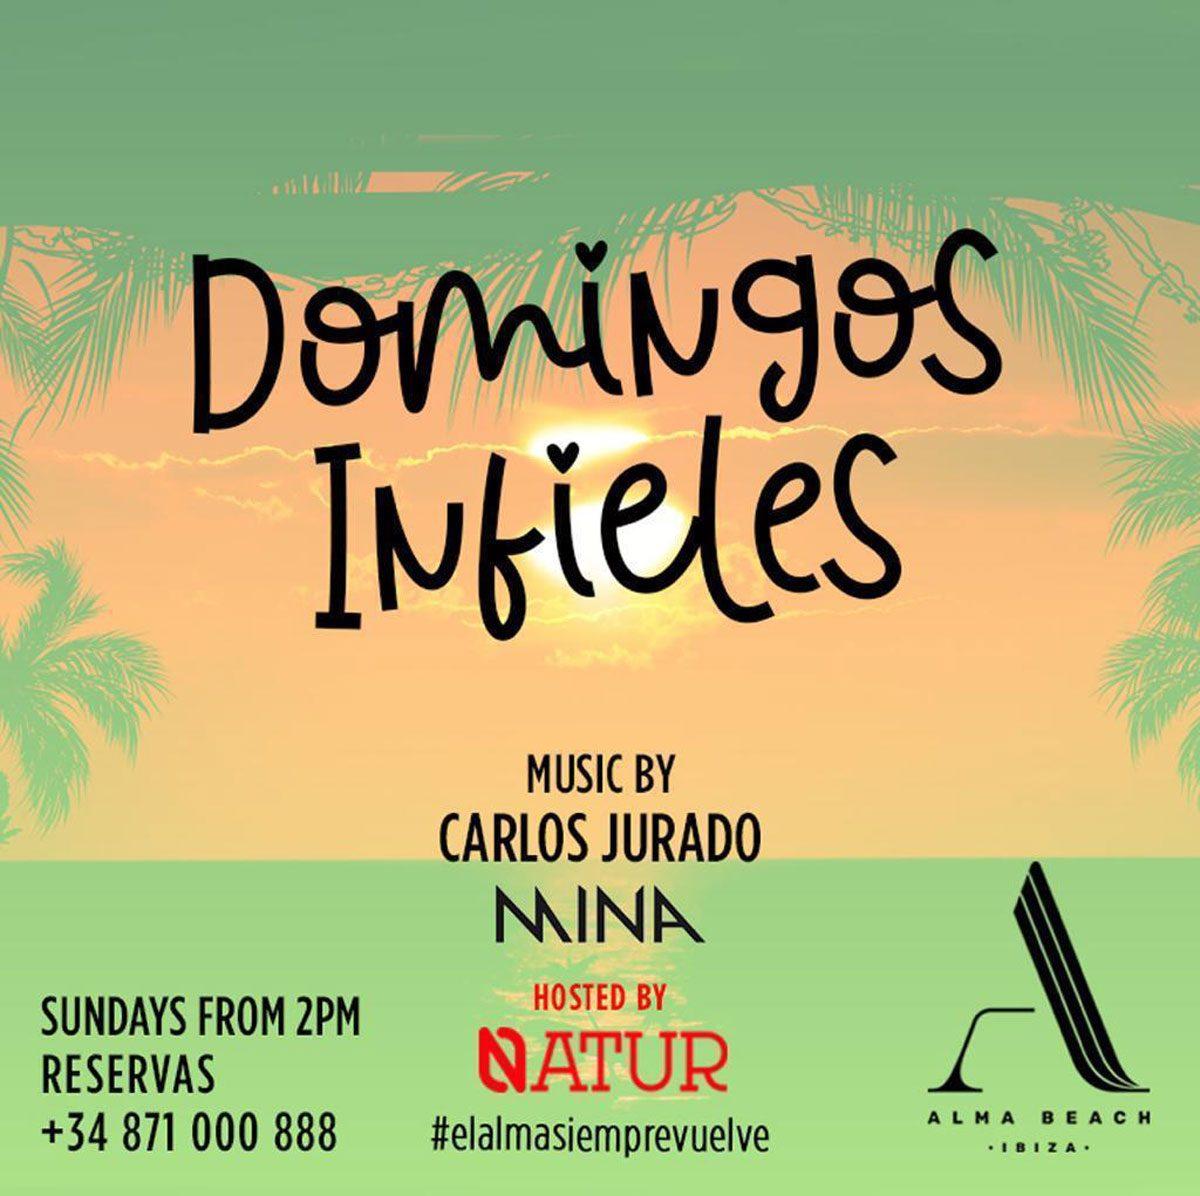 domingos-infieles-by-natur-alma-beach-ibiza-2020-welcometoibiza